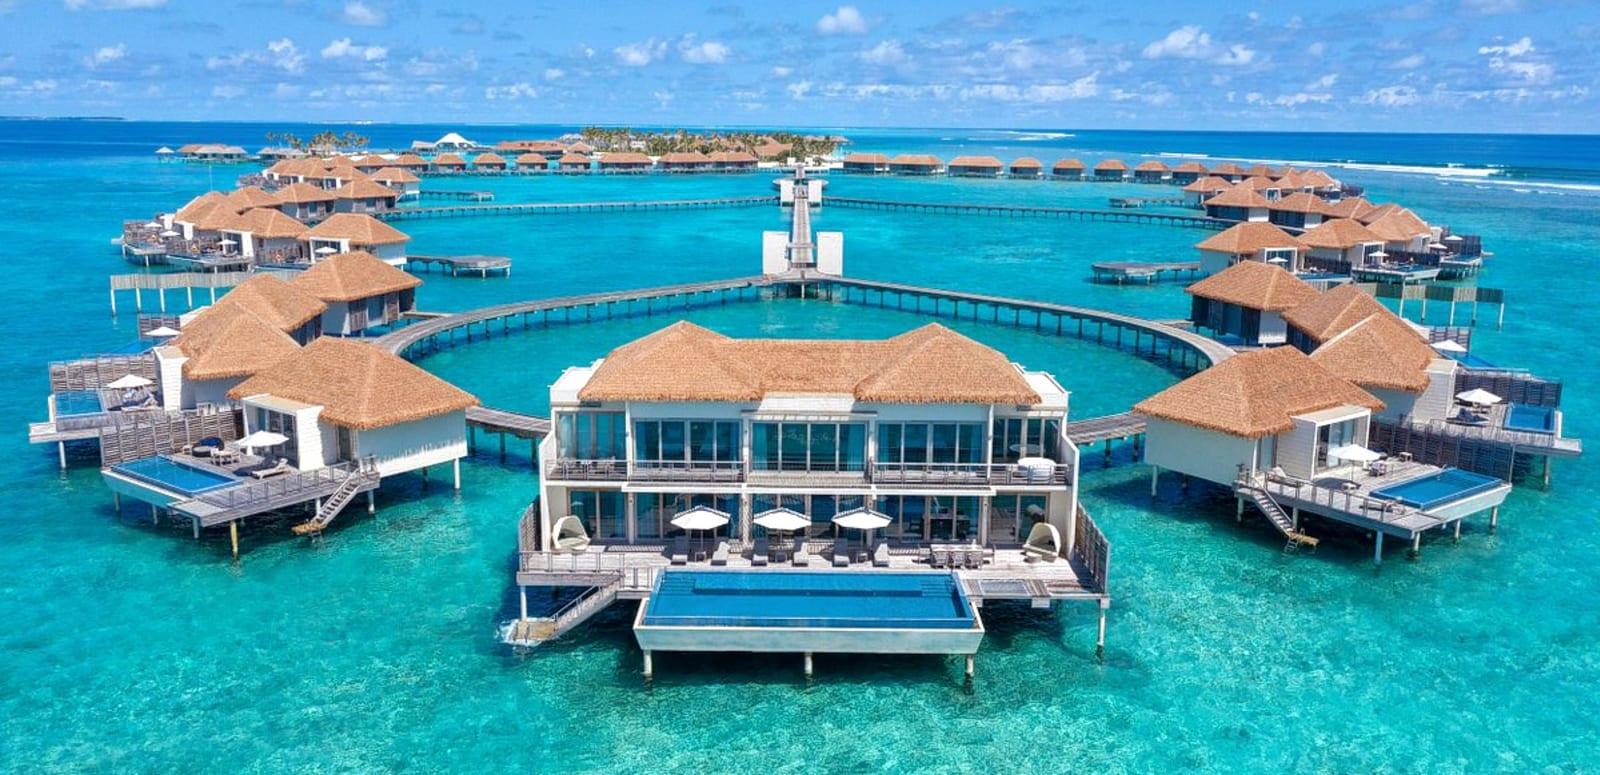 1634534424_radisson-blu-resort-maldives.jpg